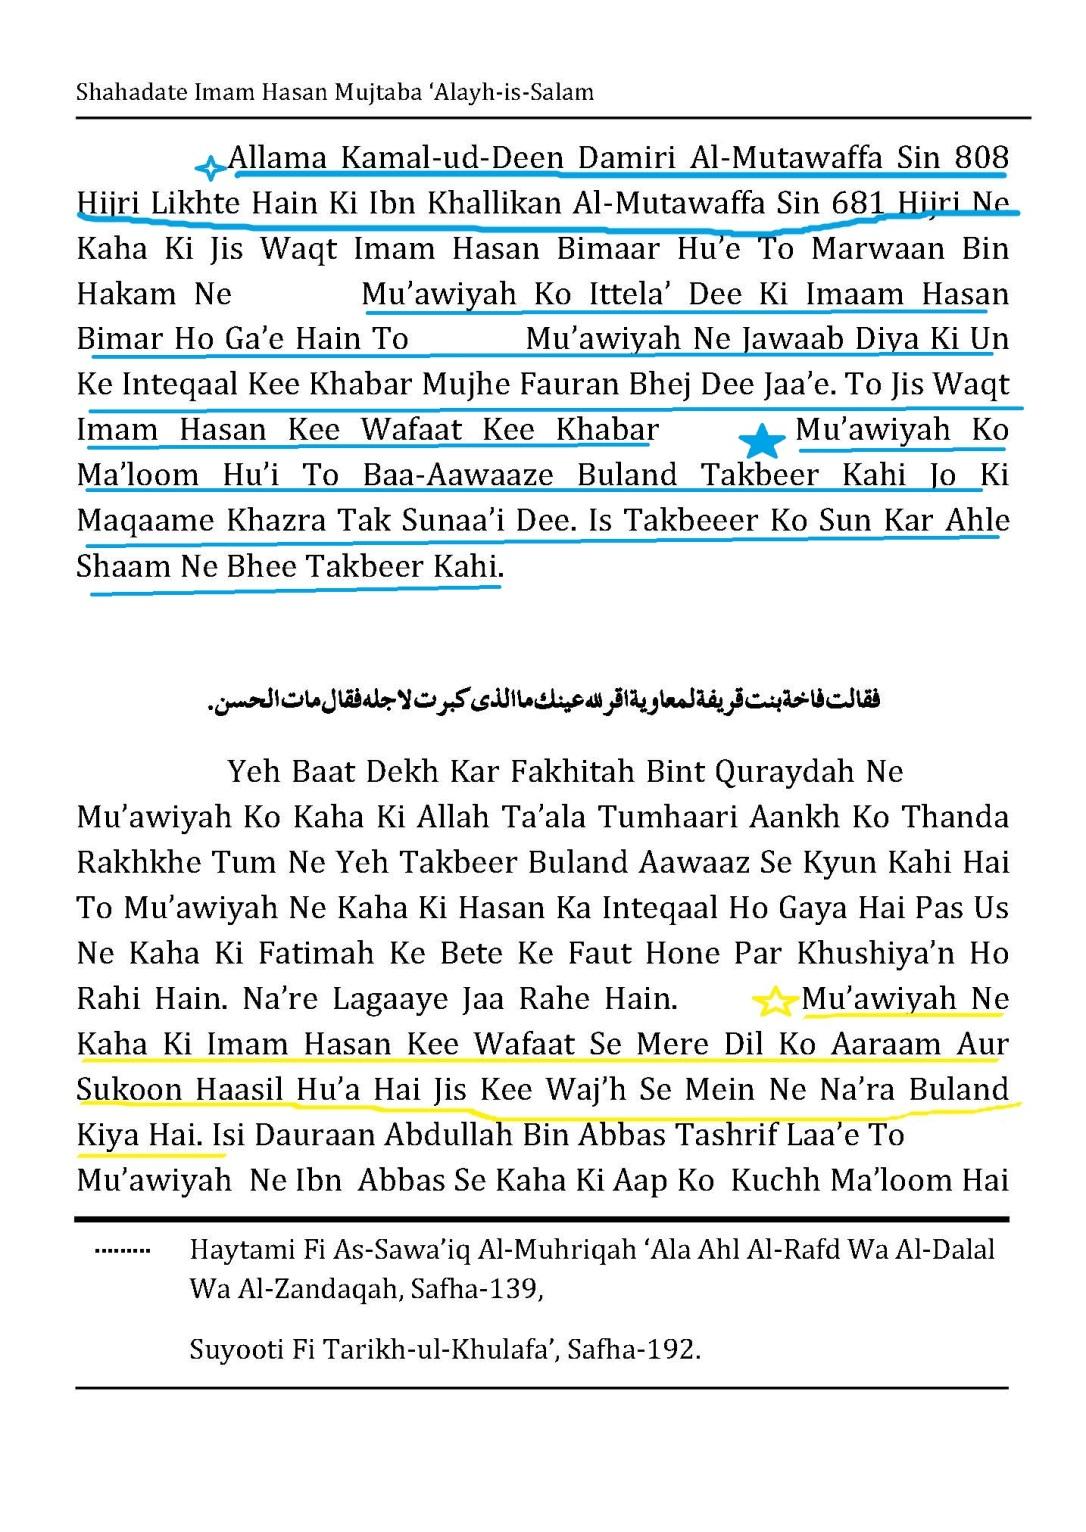 shahadate-imam-hasan-mujtaba-e28098alayh-is-salam-pdf_unlocked_Page_11